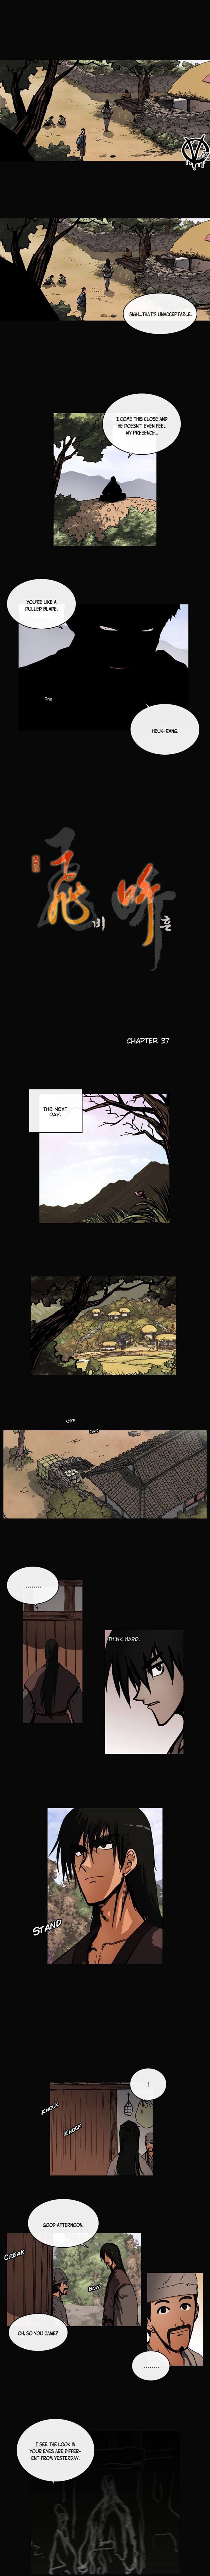 Be Heun 37 Page 2